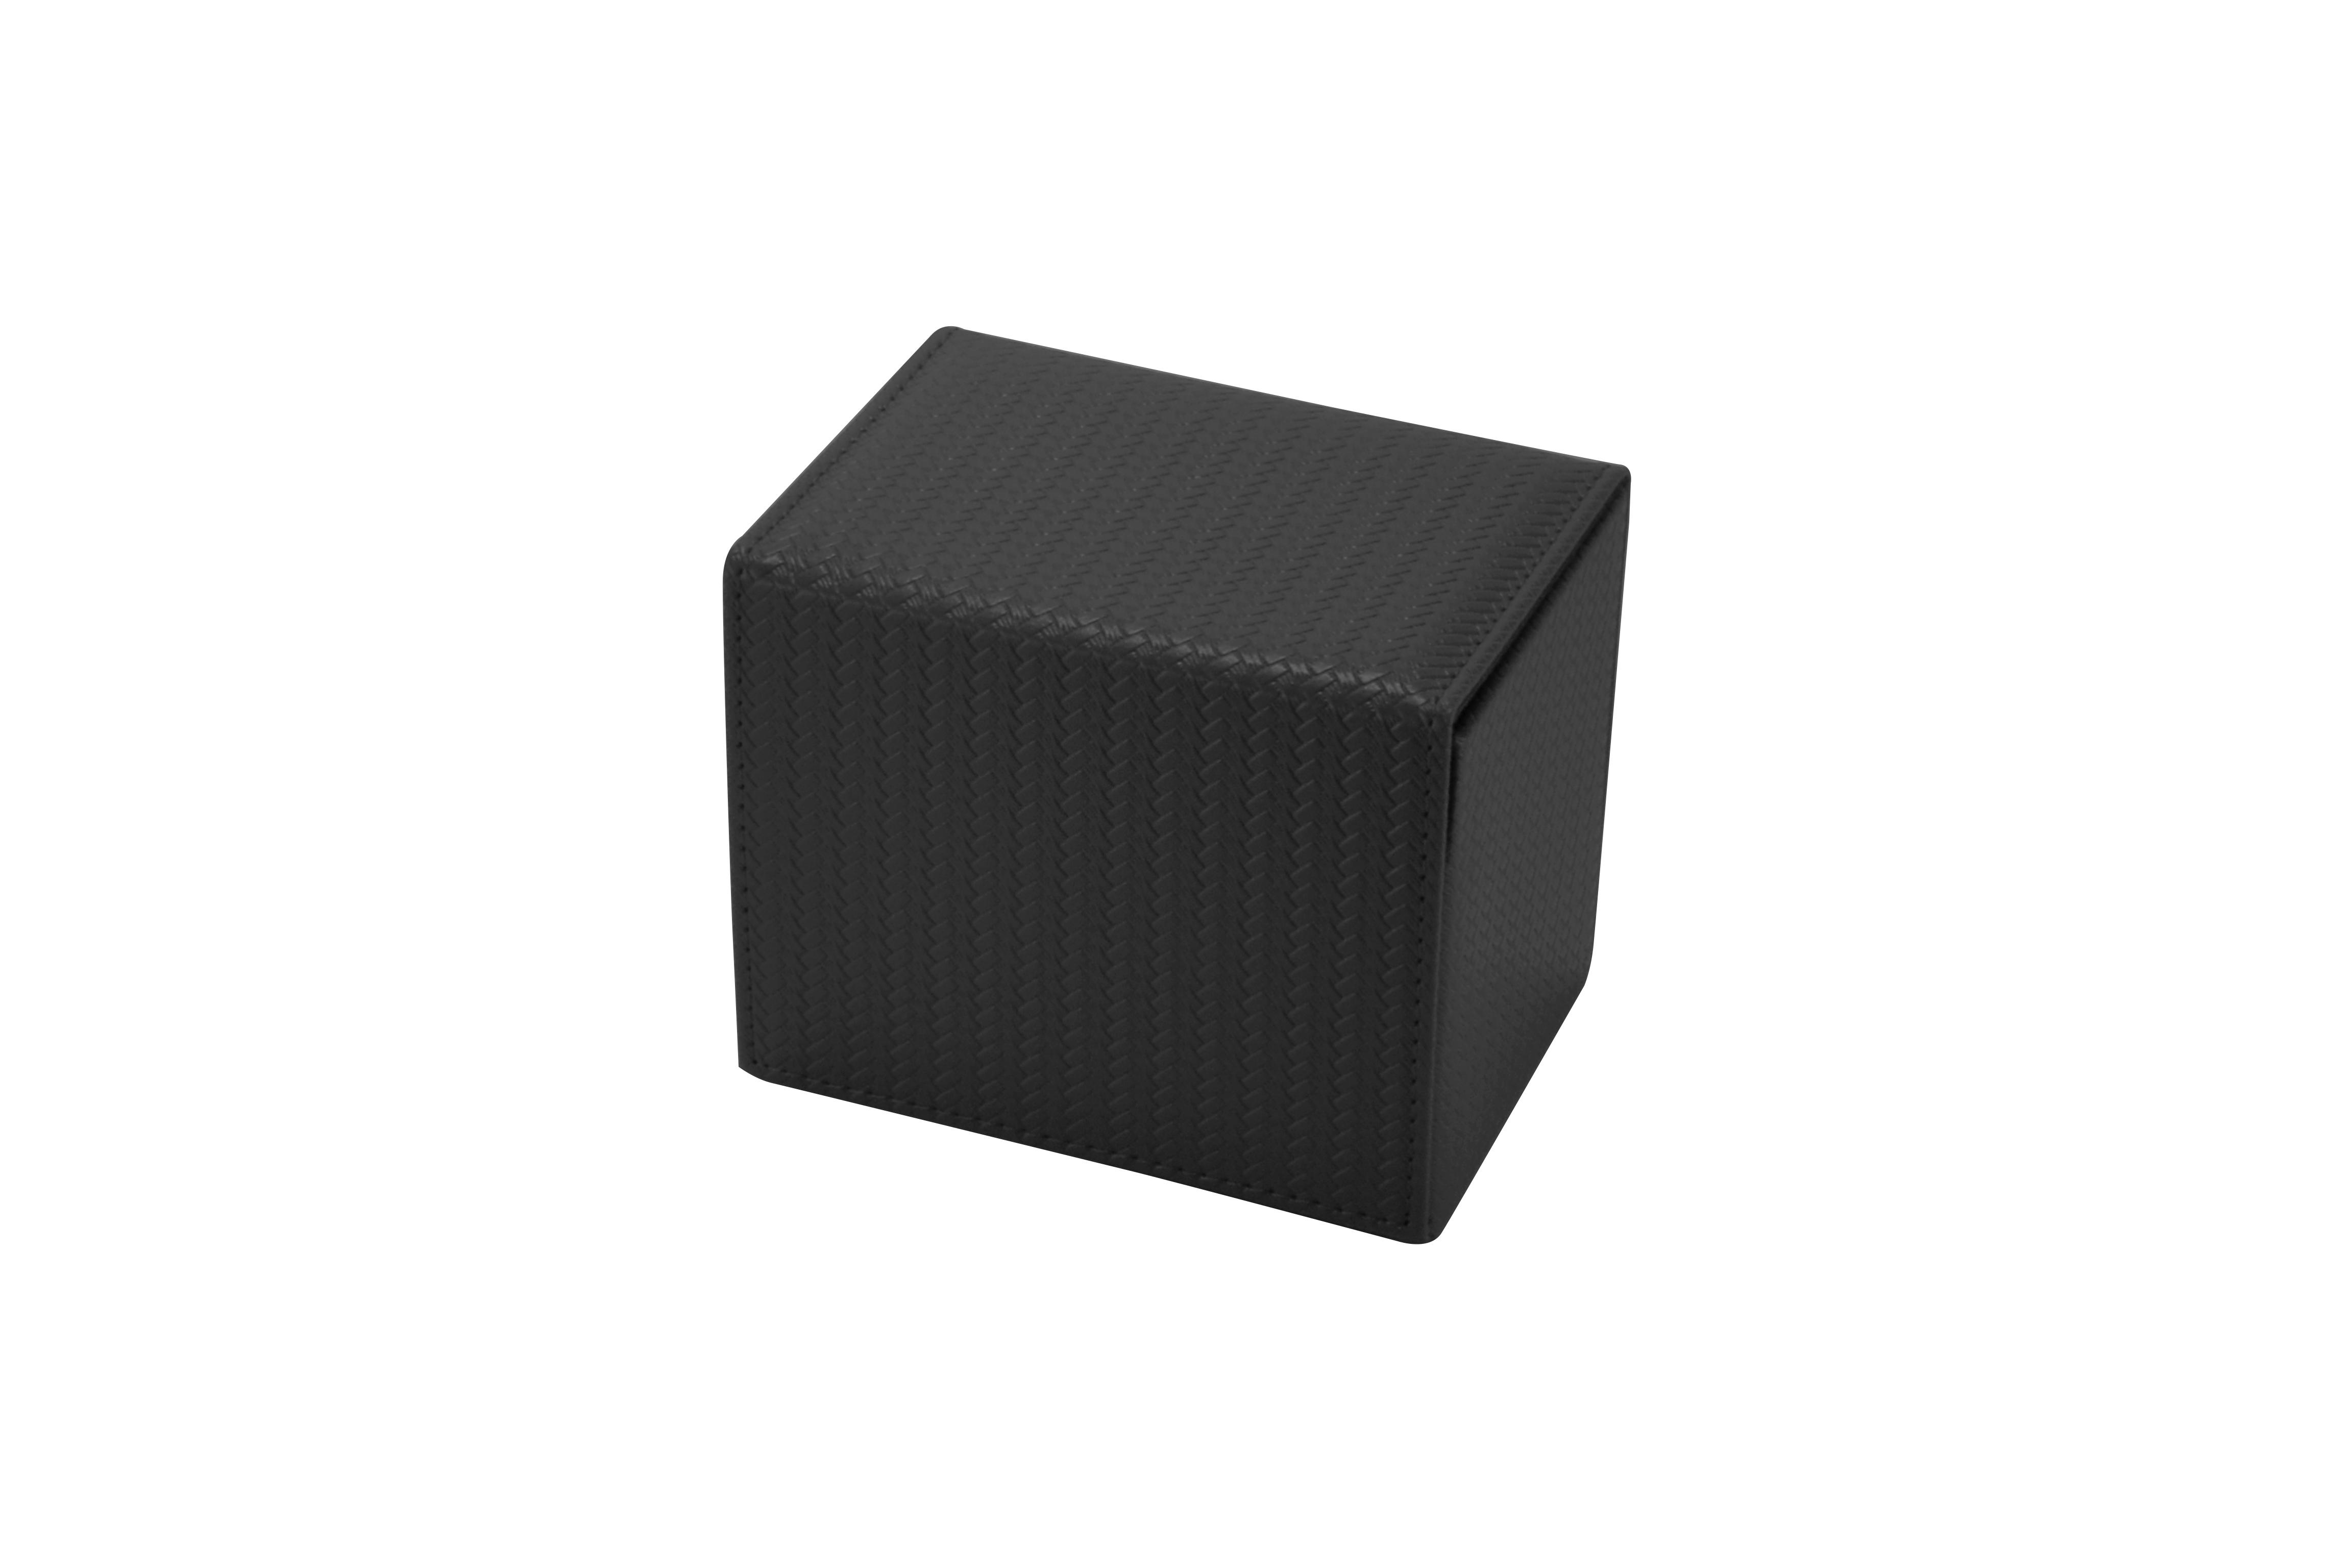 Dex Protection - Proline Deckbox - Large - Black